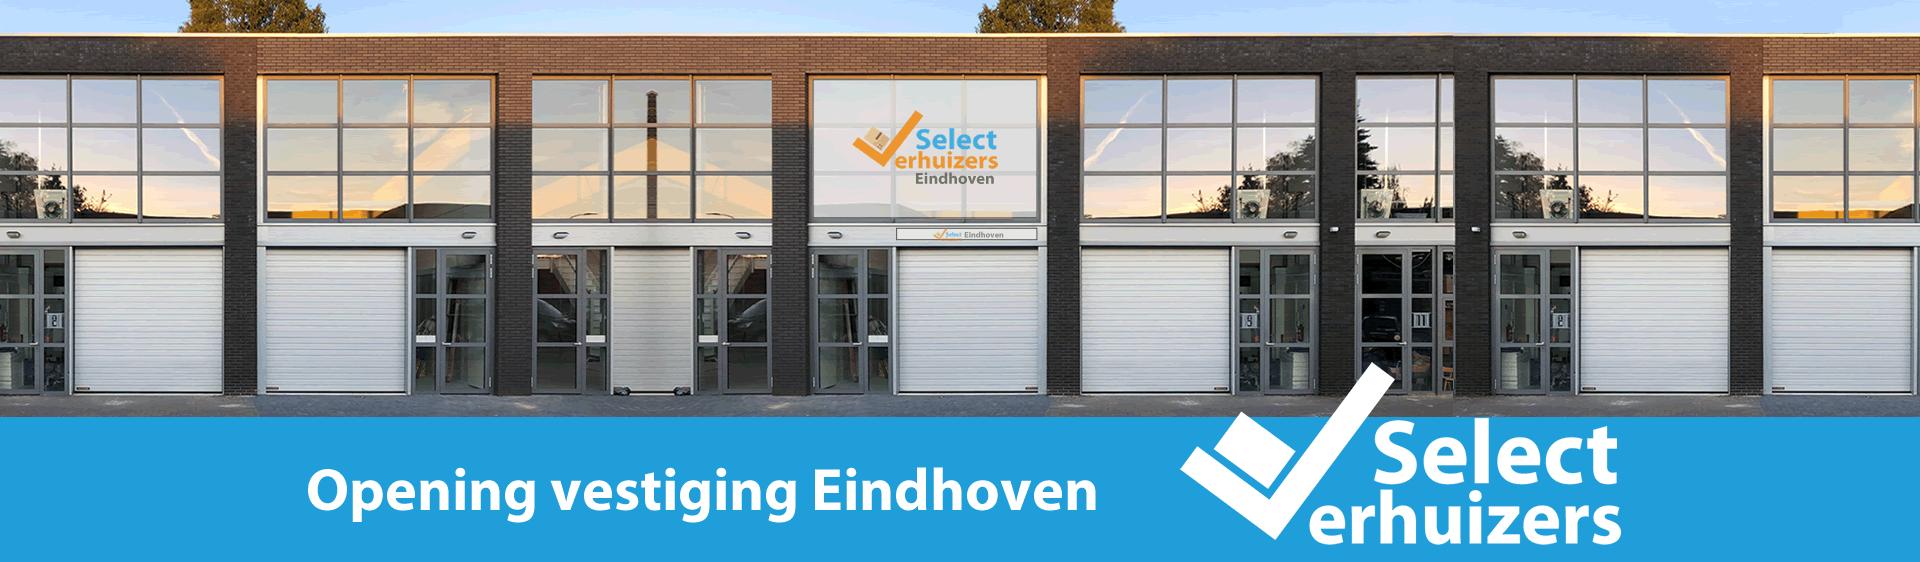 Select Verhuizers Eindhoven geopend!